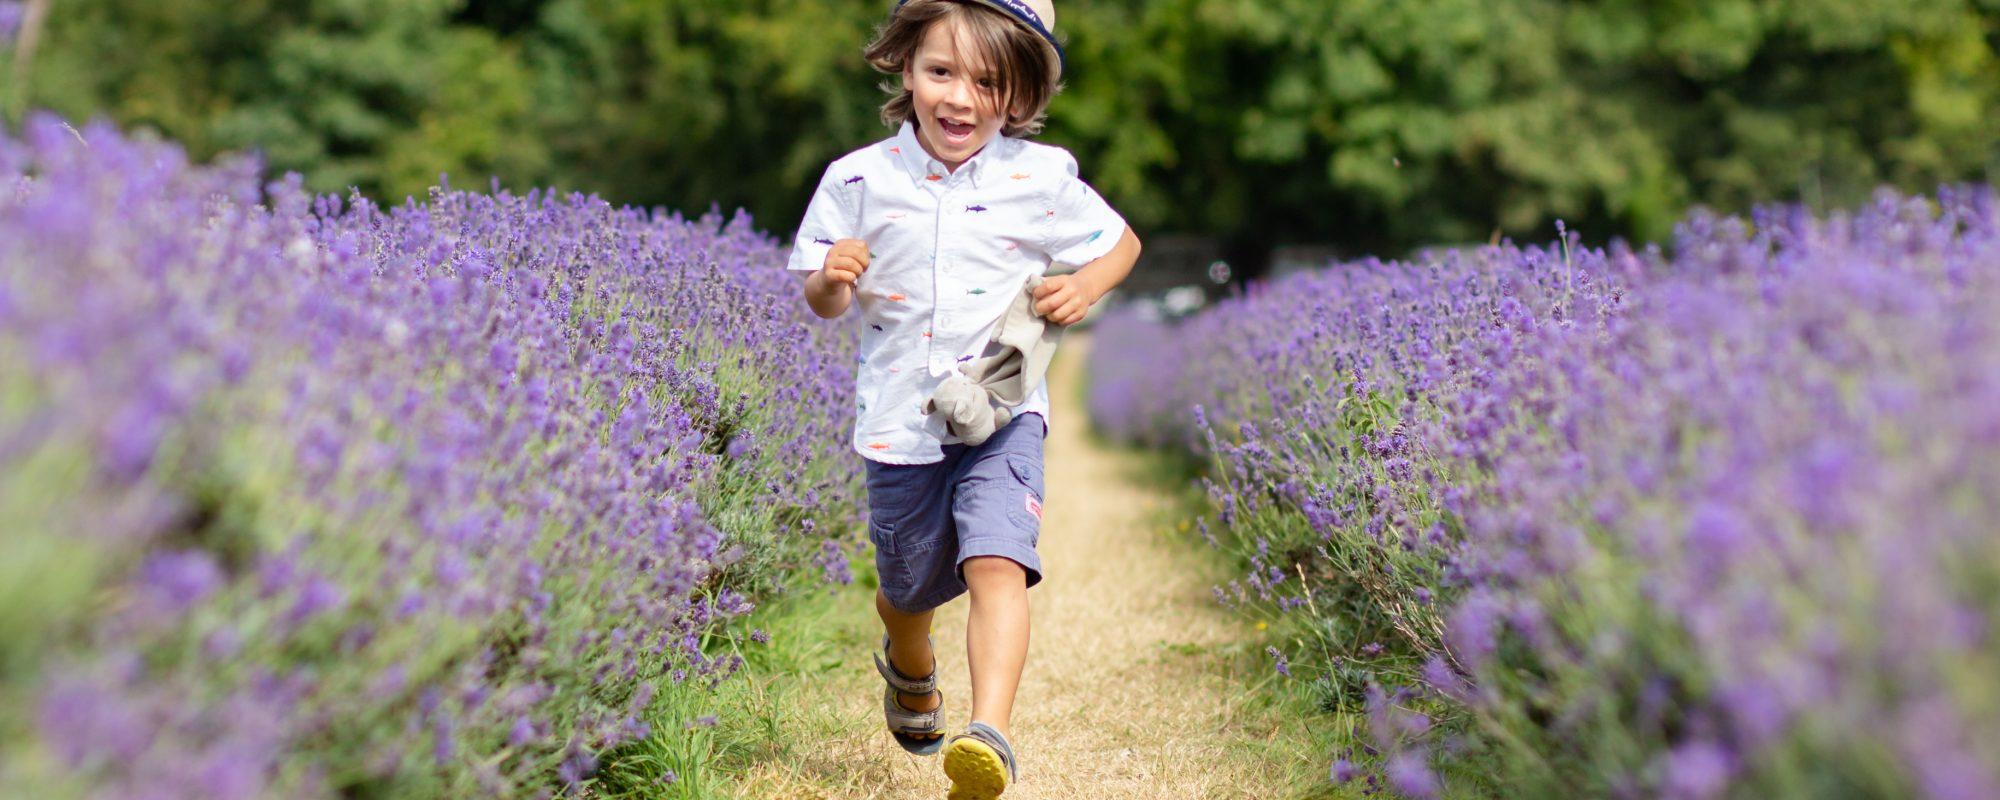 Lavender field photoshoot